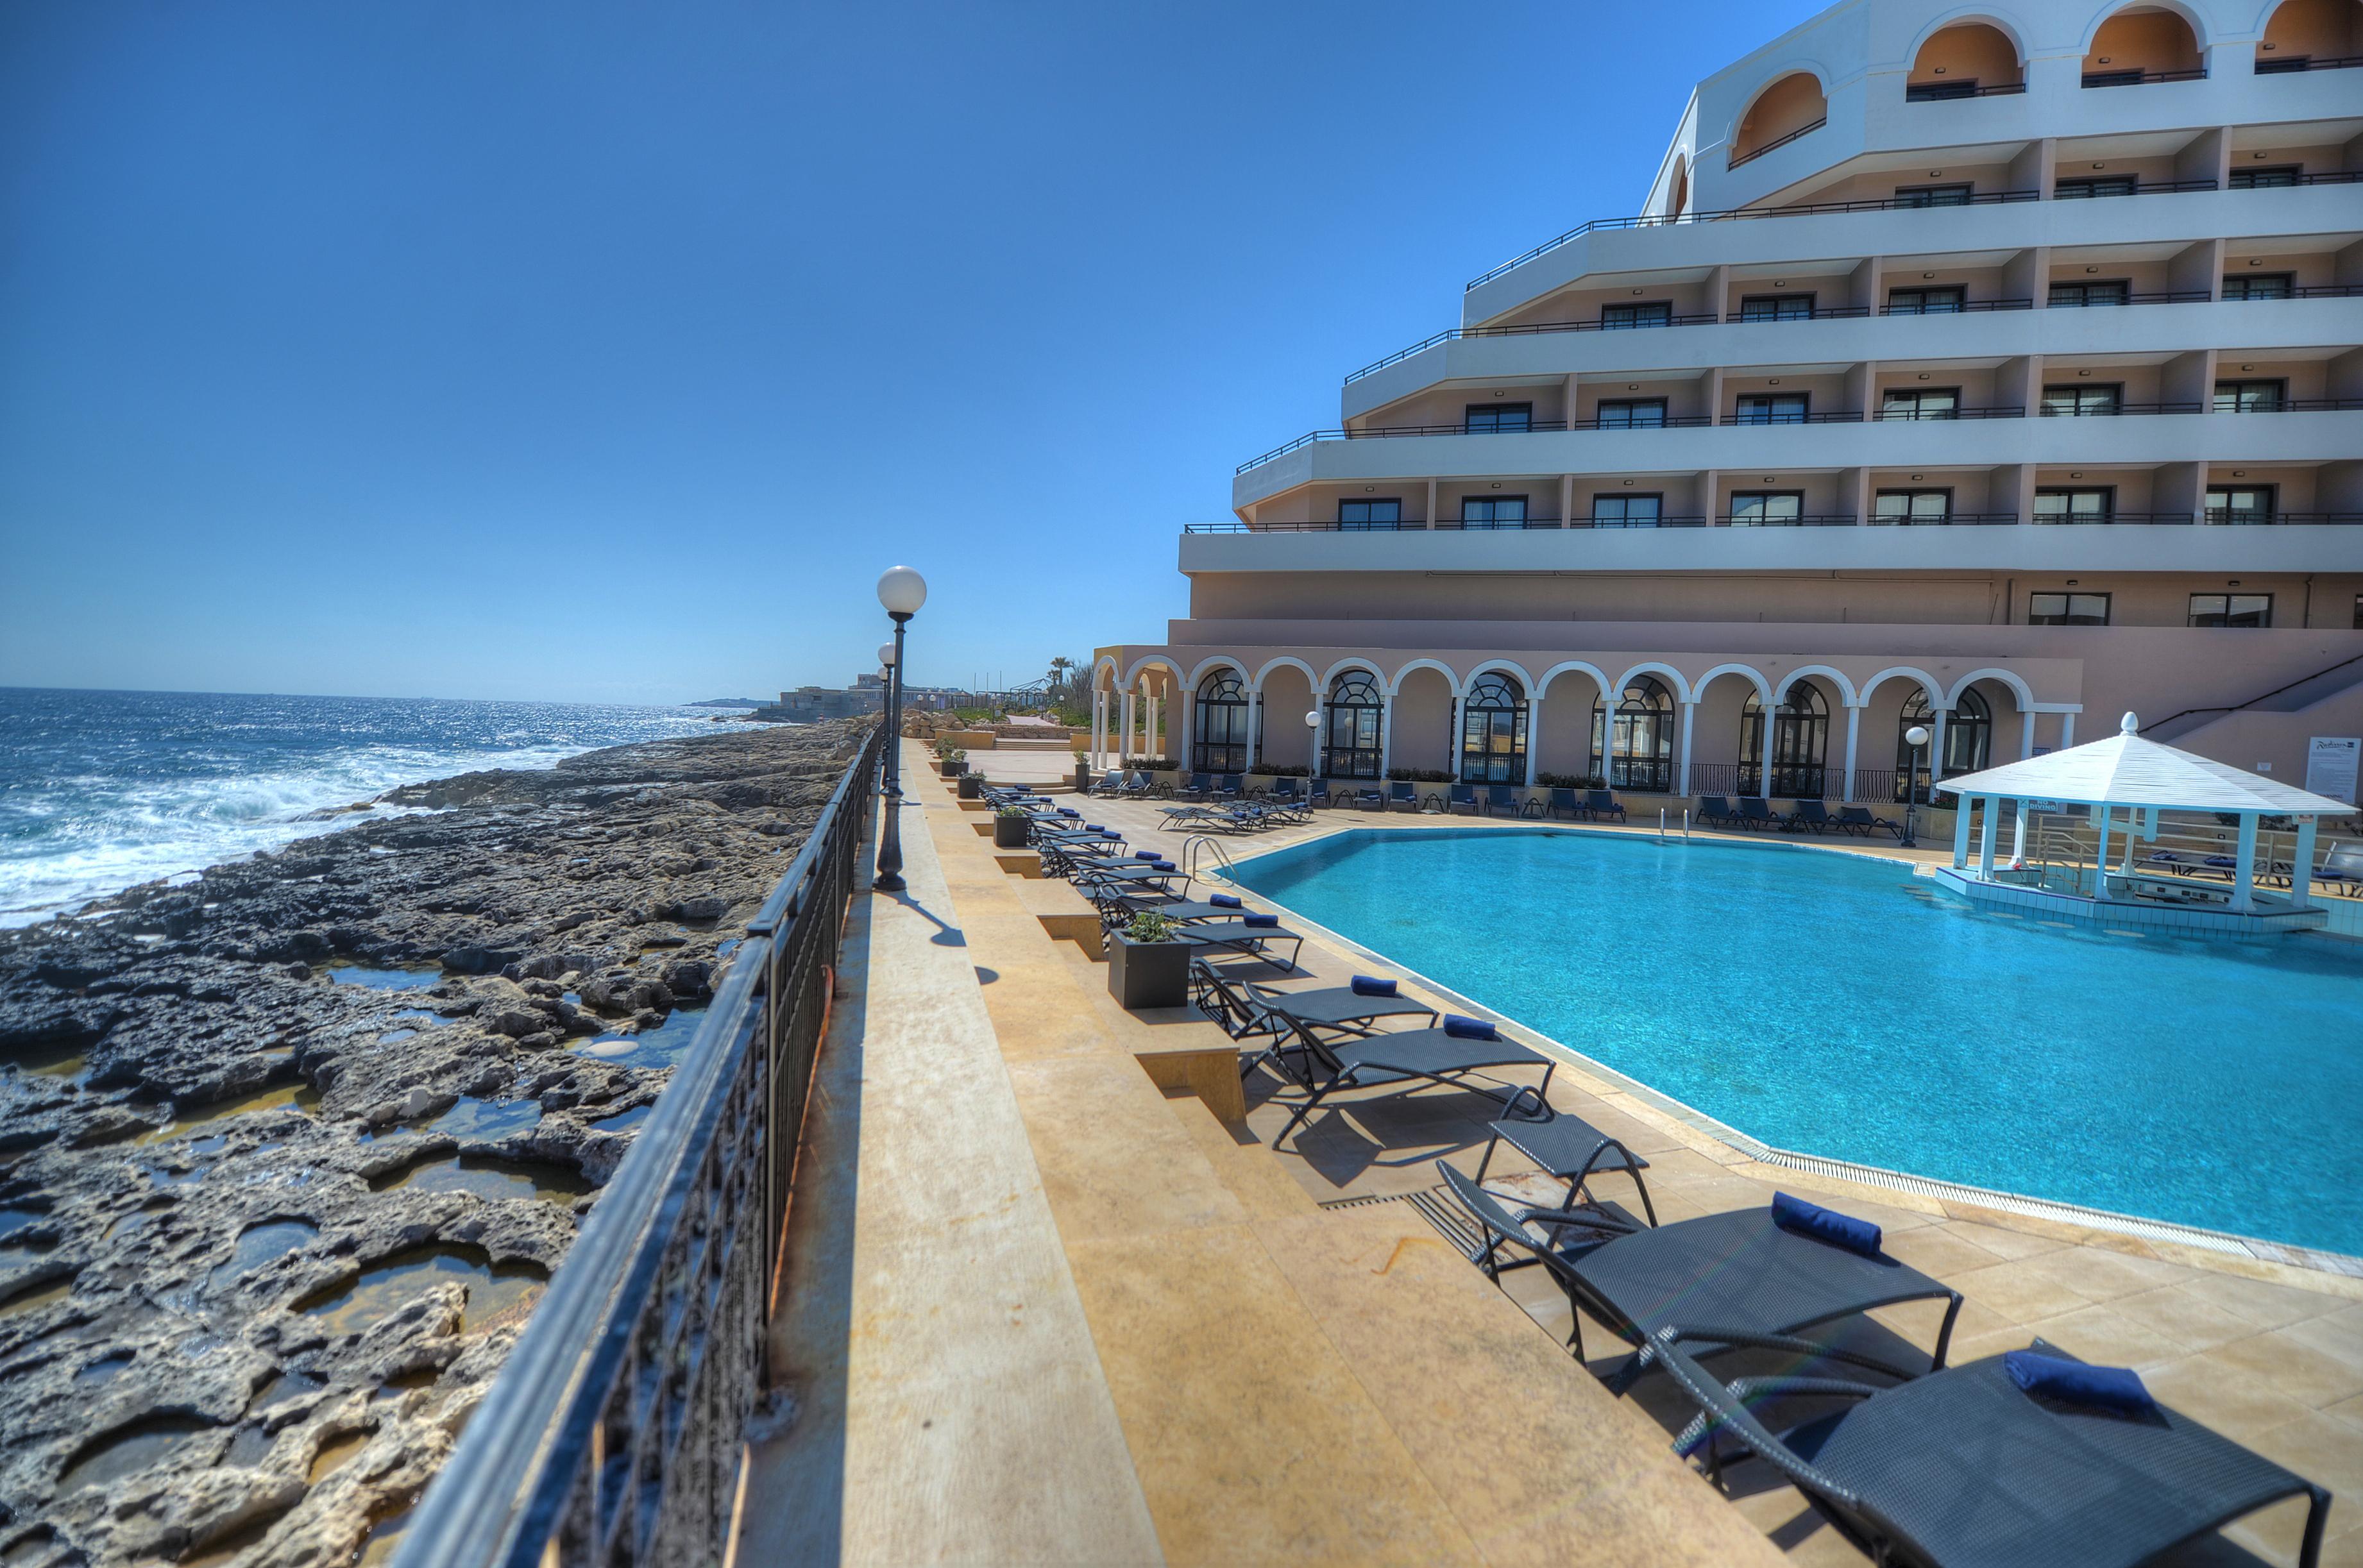 Radisson Blu Resort, Malta St Julians photo